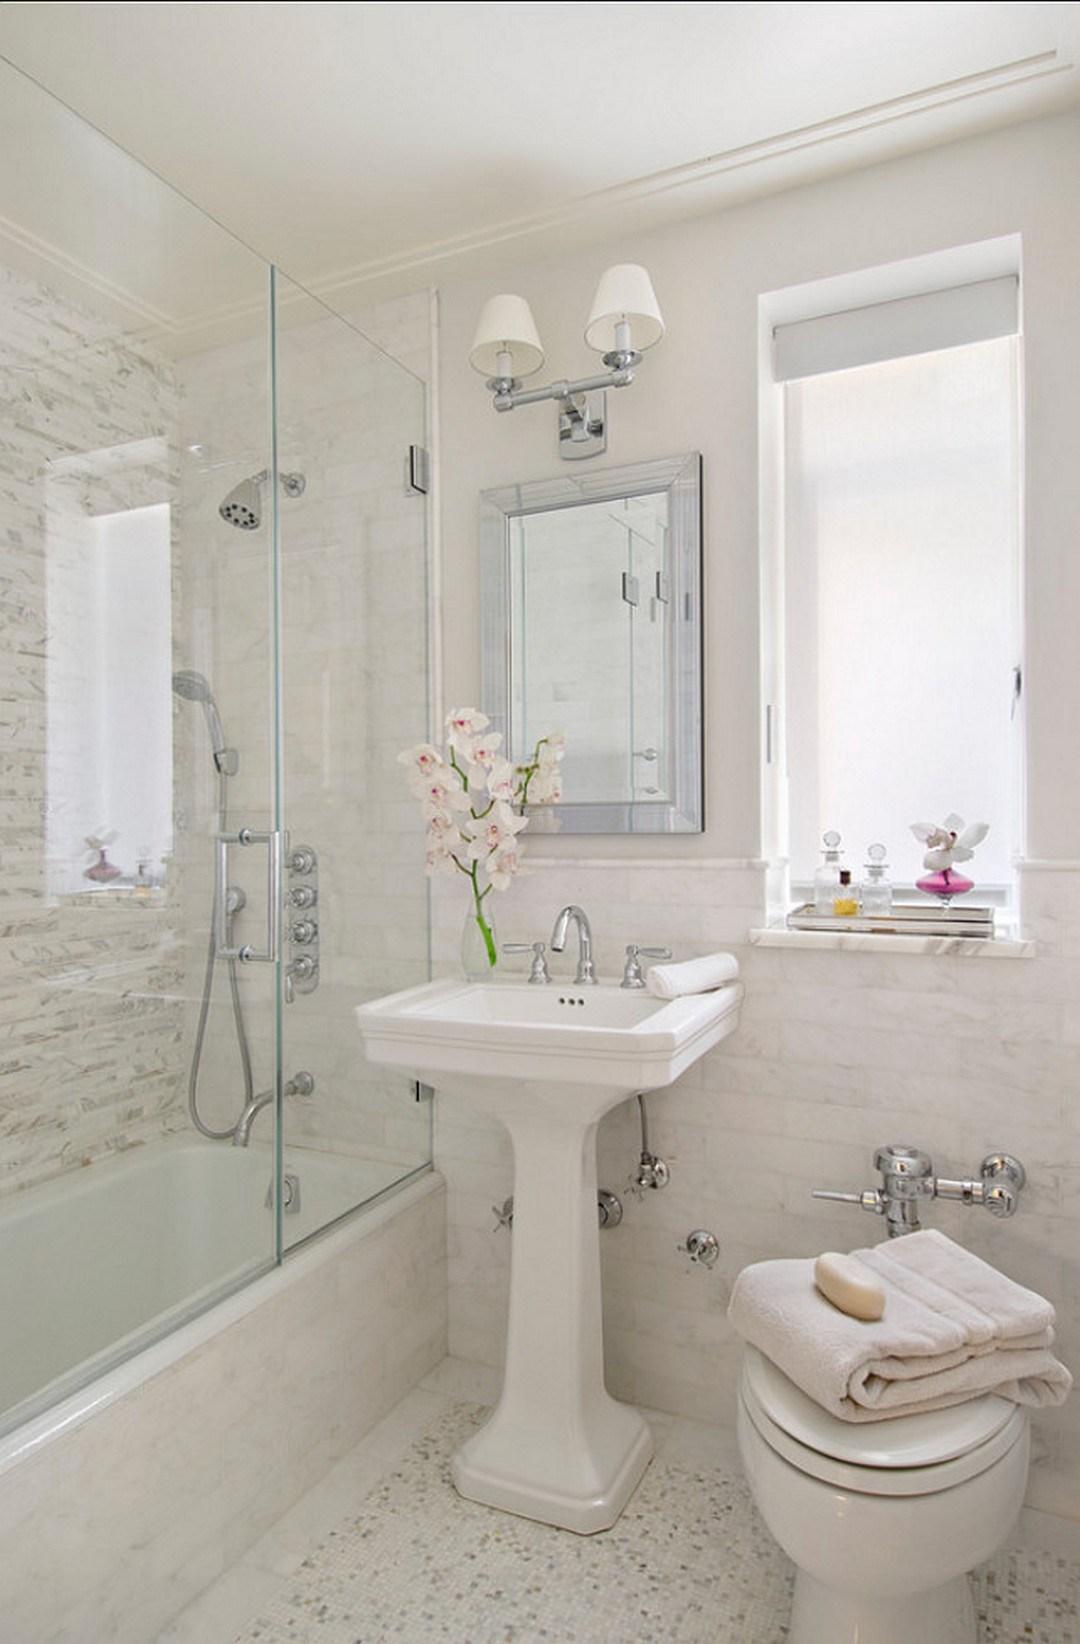 Petite salle de bain blanche